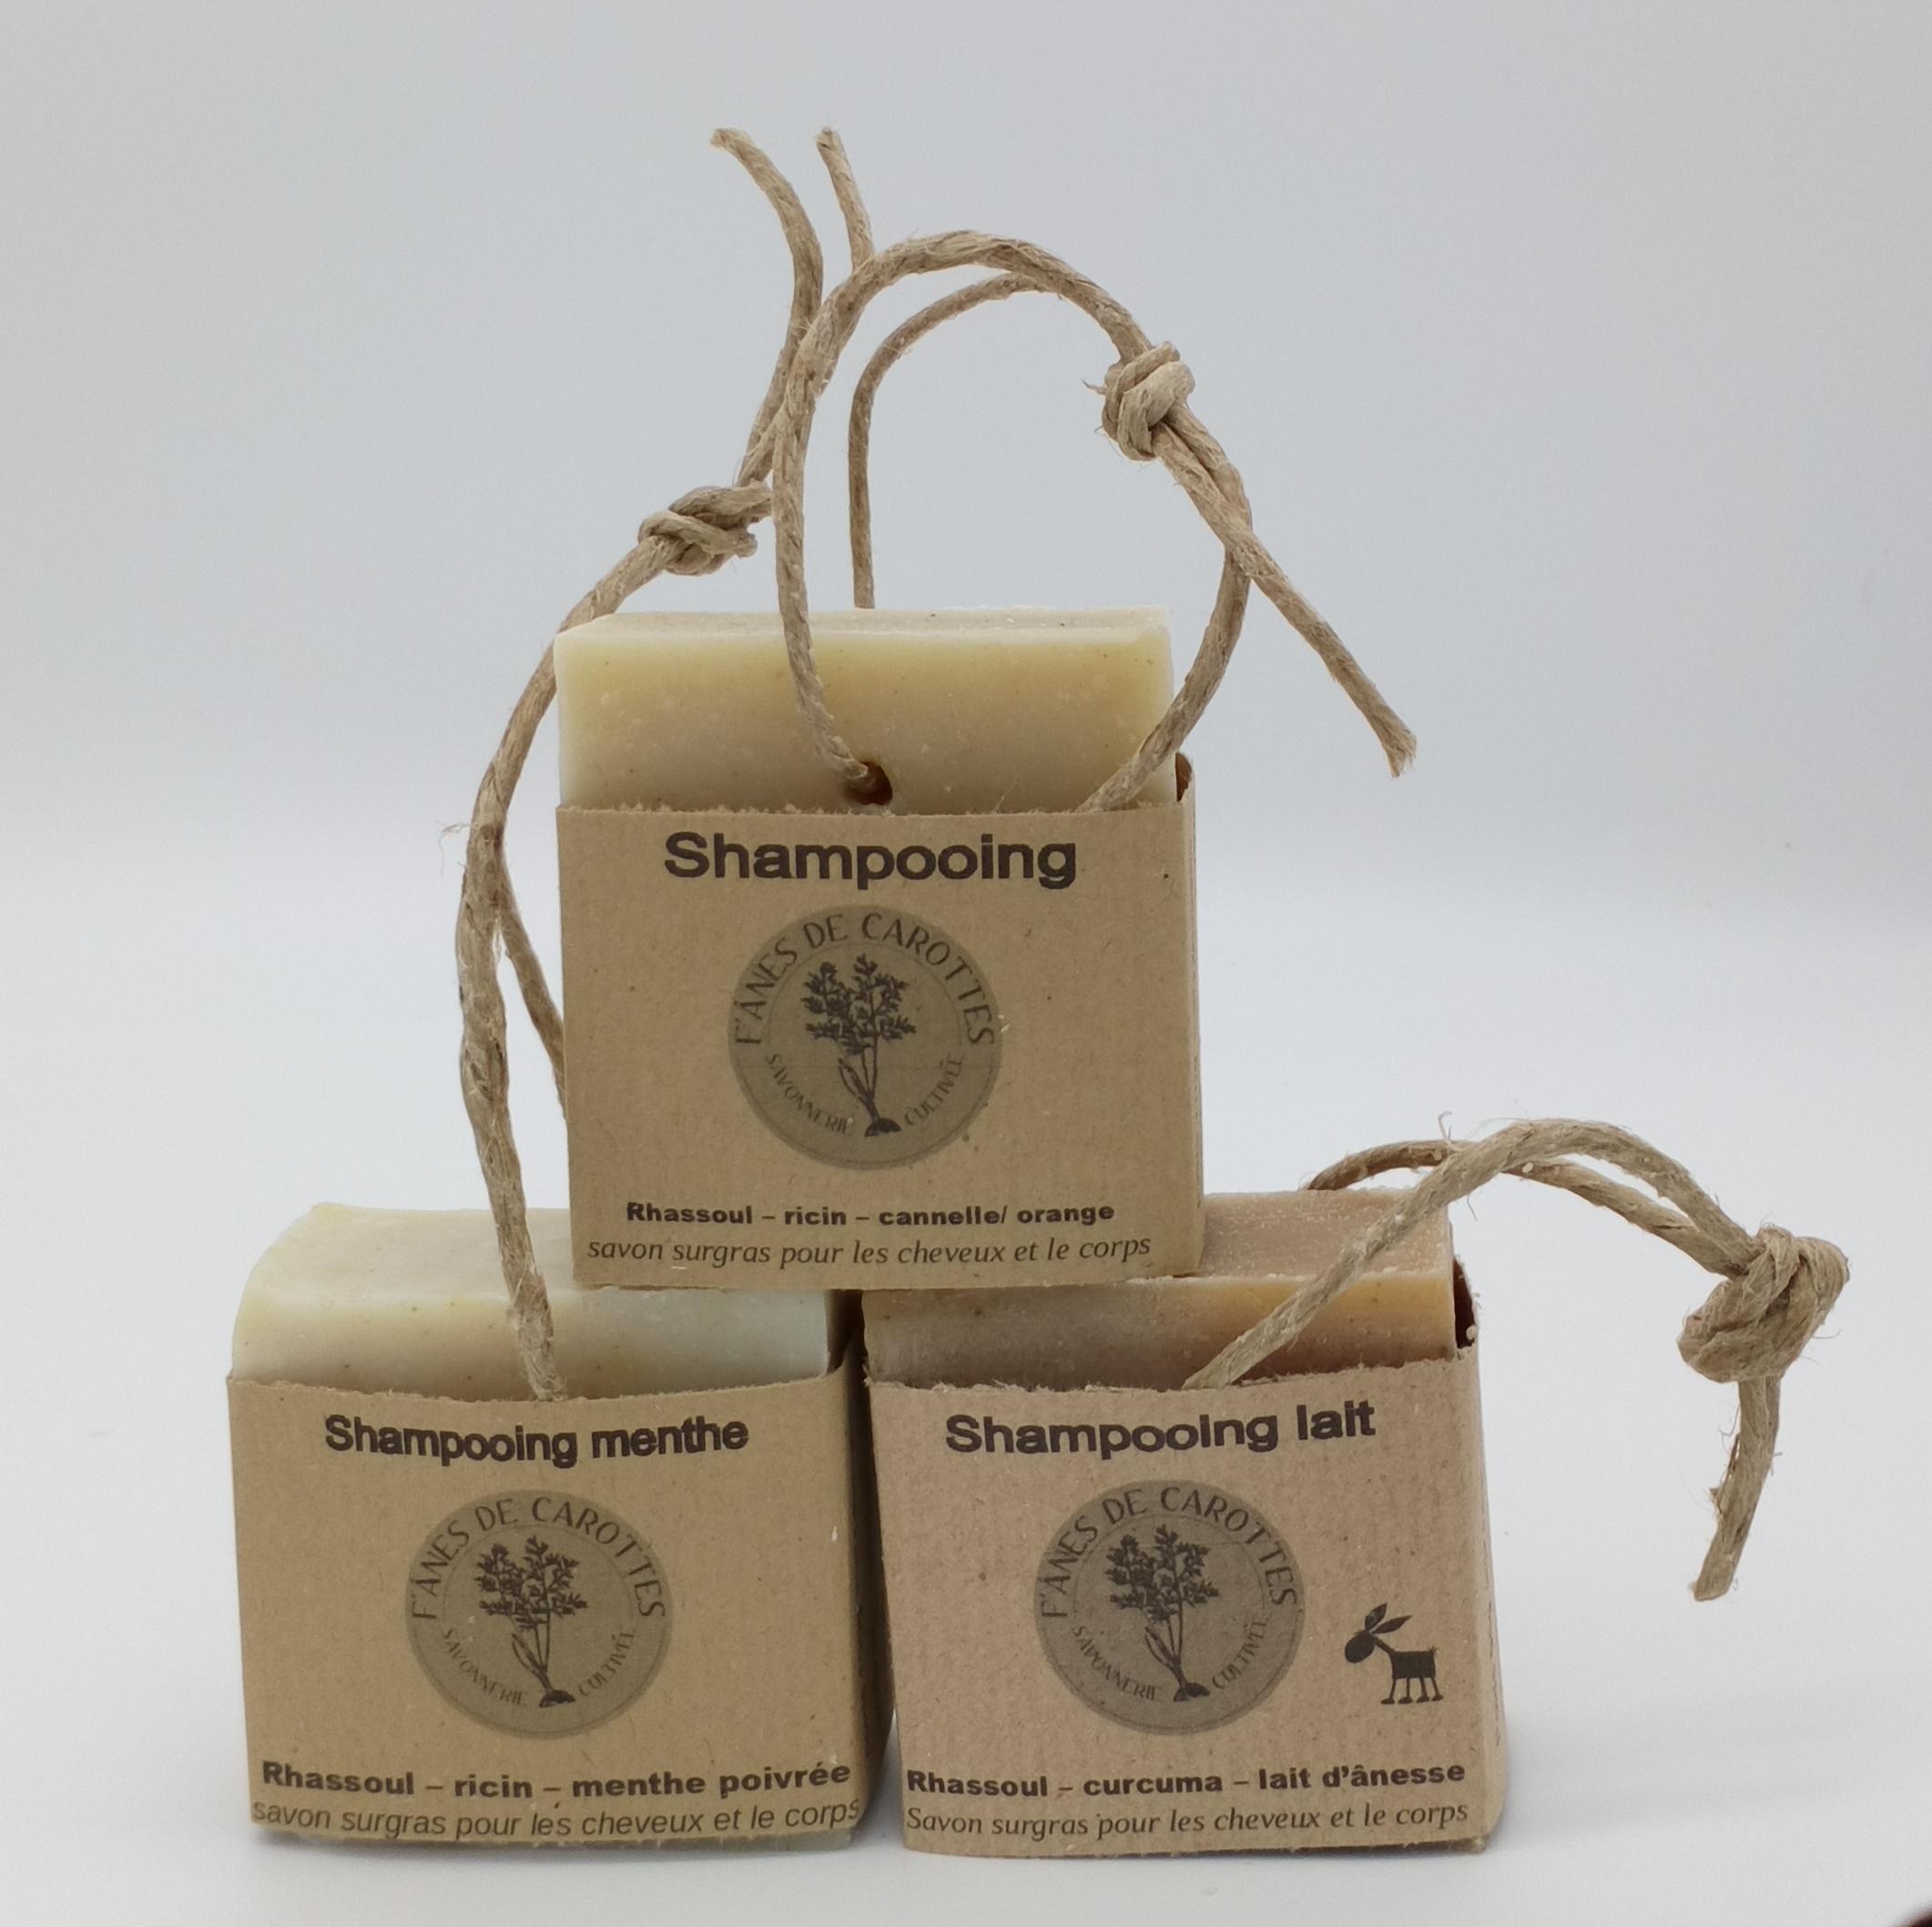 shampooing, f'ânes de carottes